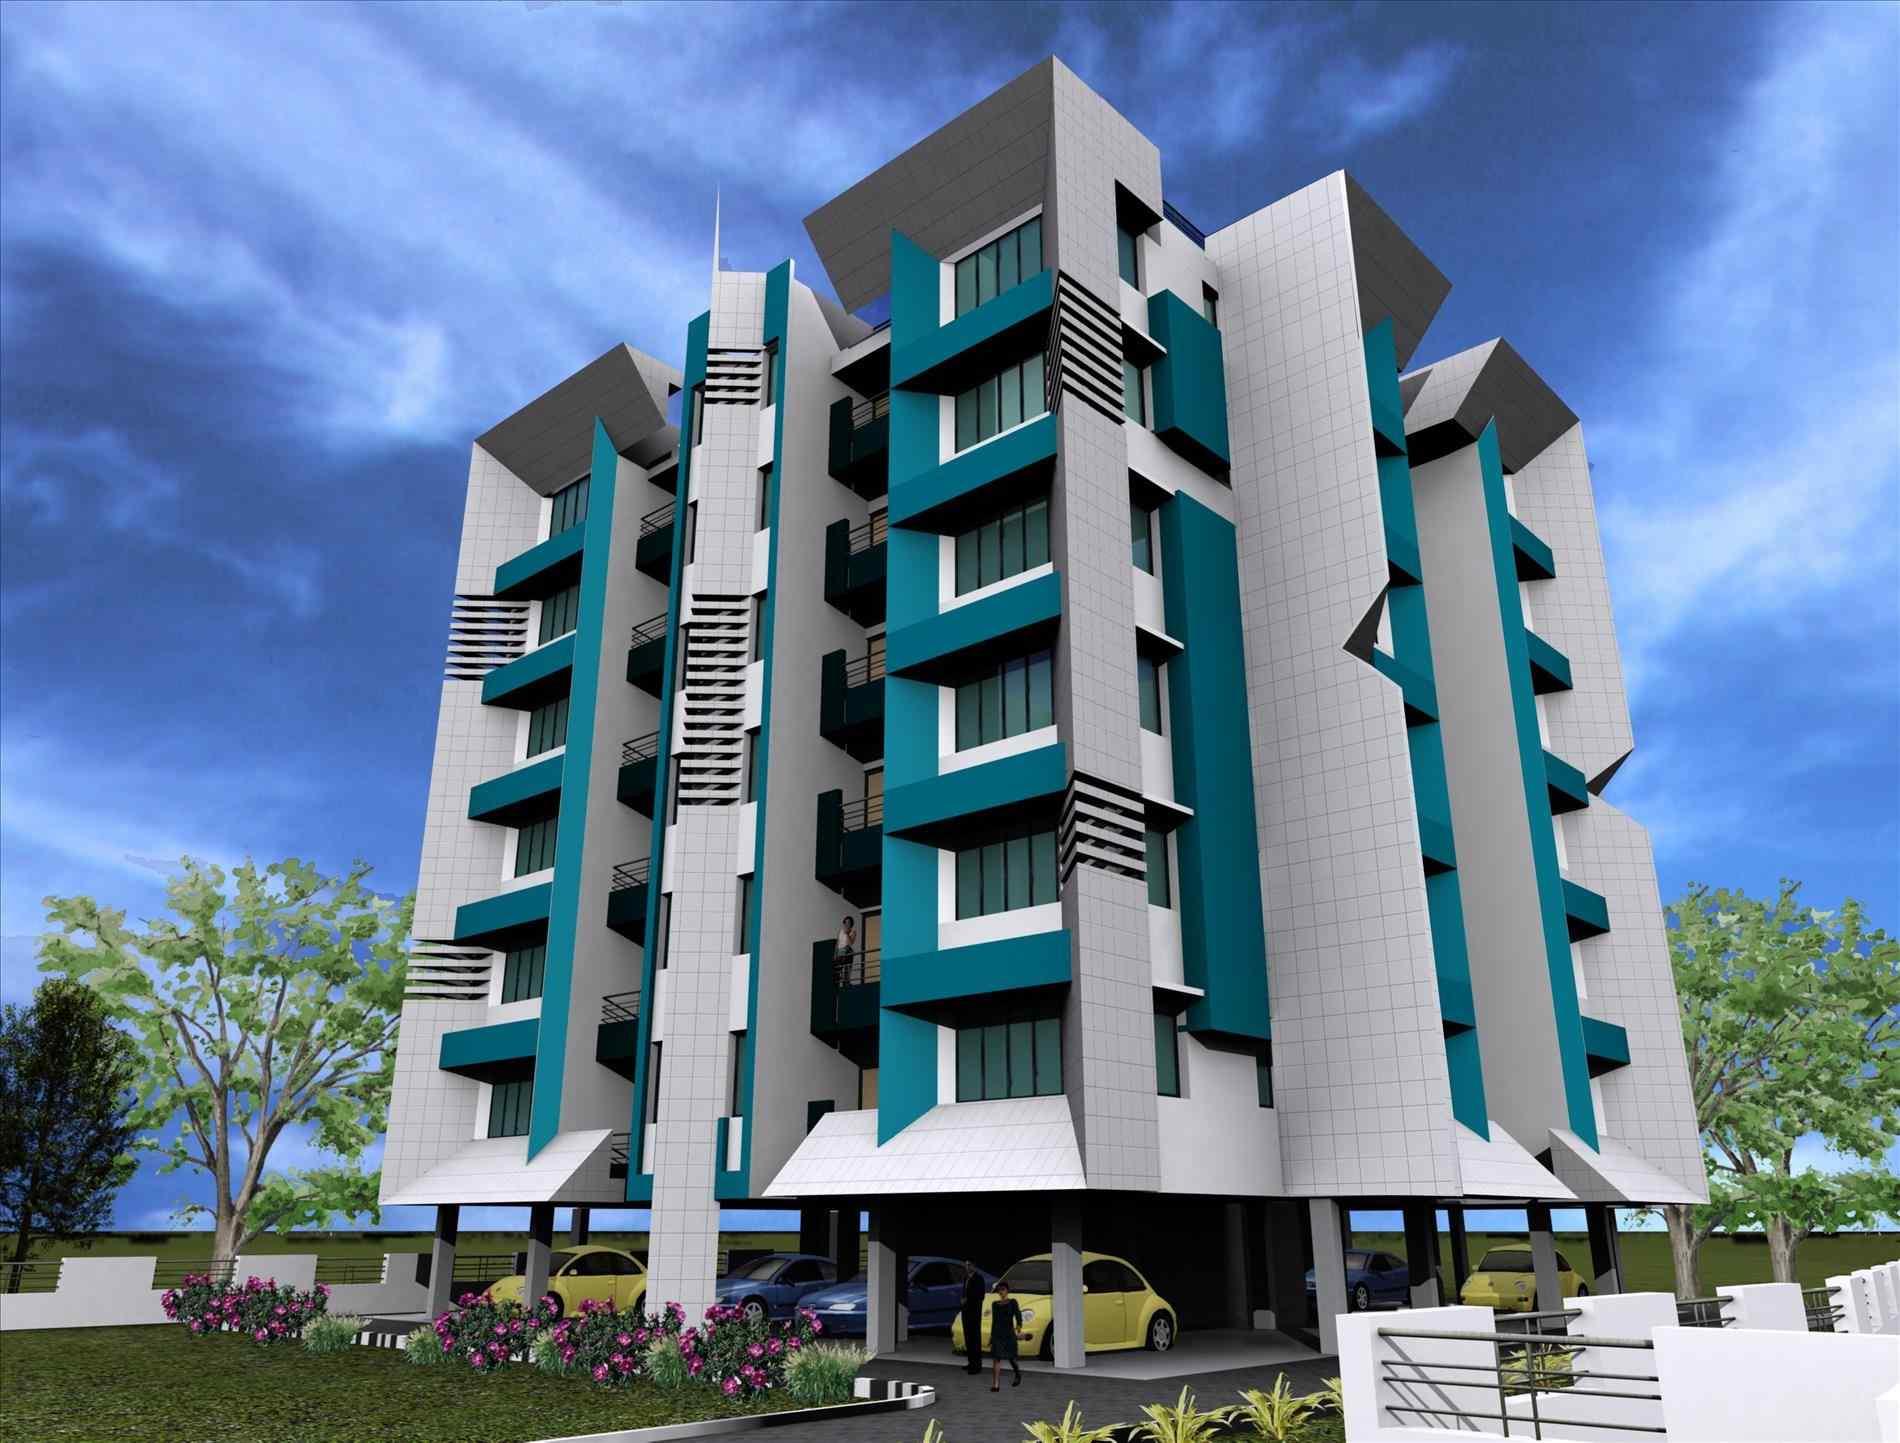 Apartment clipart building design. Complex athelred com pencil